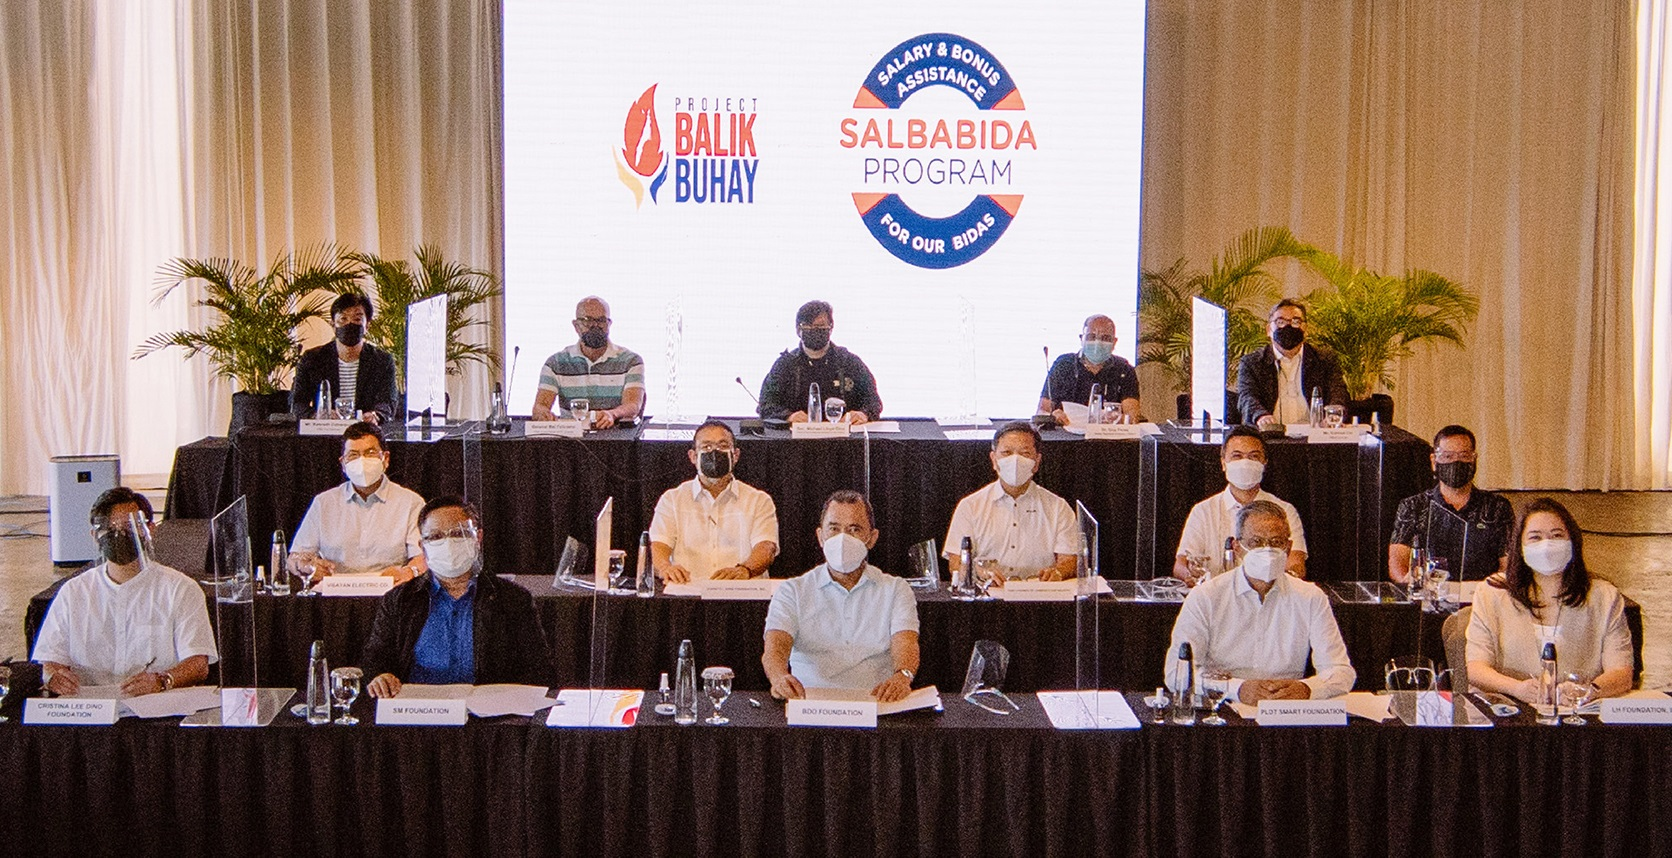 Salbabida program for nurses